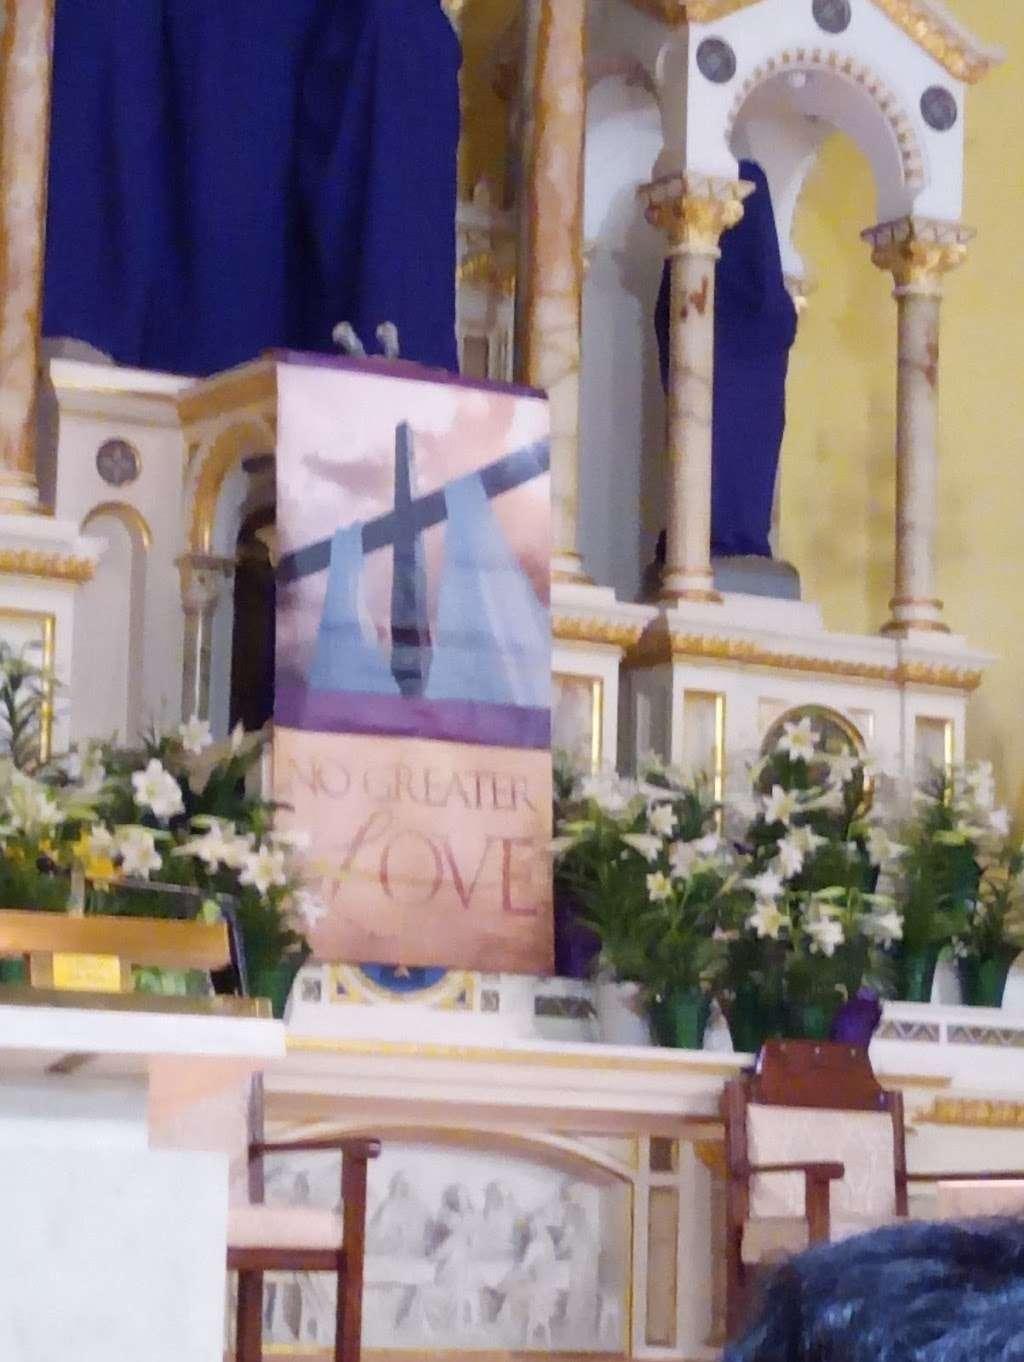 St Anthonys Catholic Church Parish Office - church    Photo 3 of 10   Address: 1510 S 49th Ct, Cicero, IL 60804, USA   Phone: (708) 652-0231